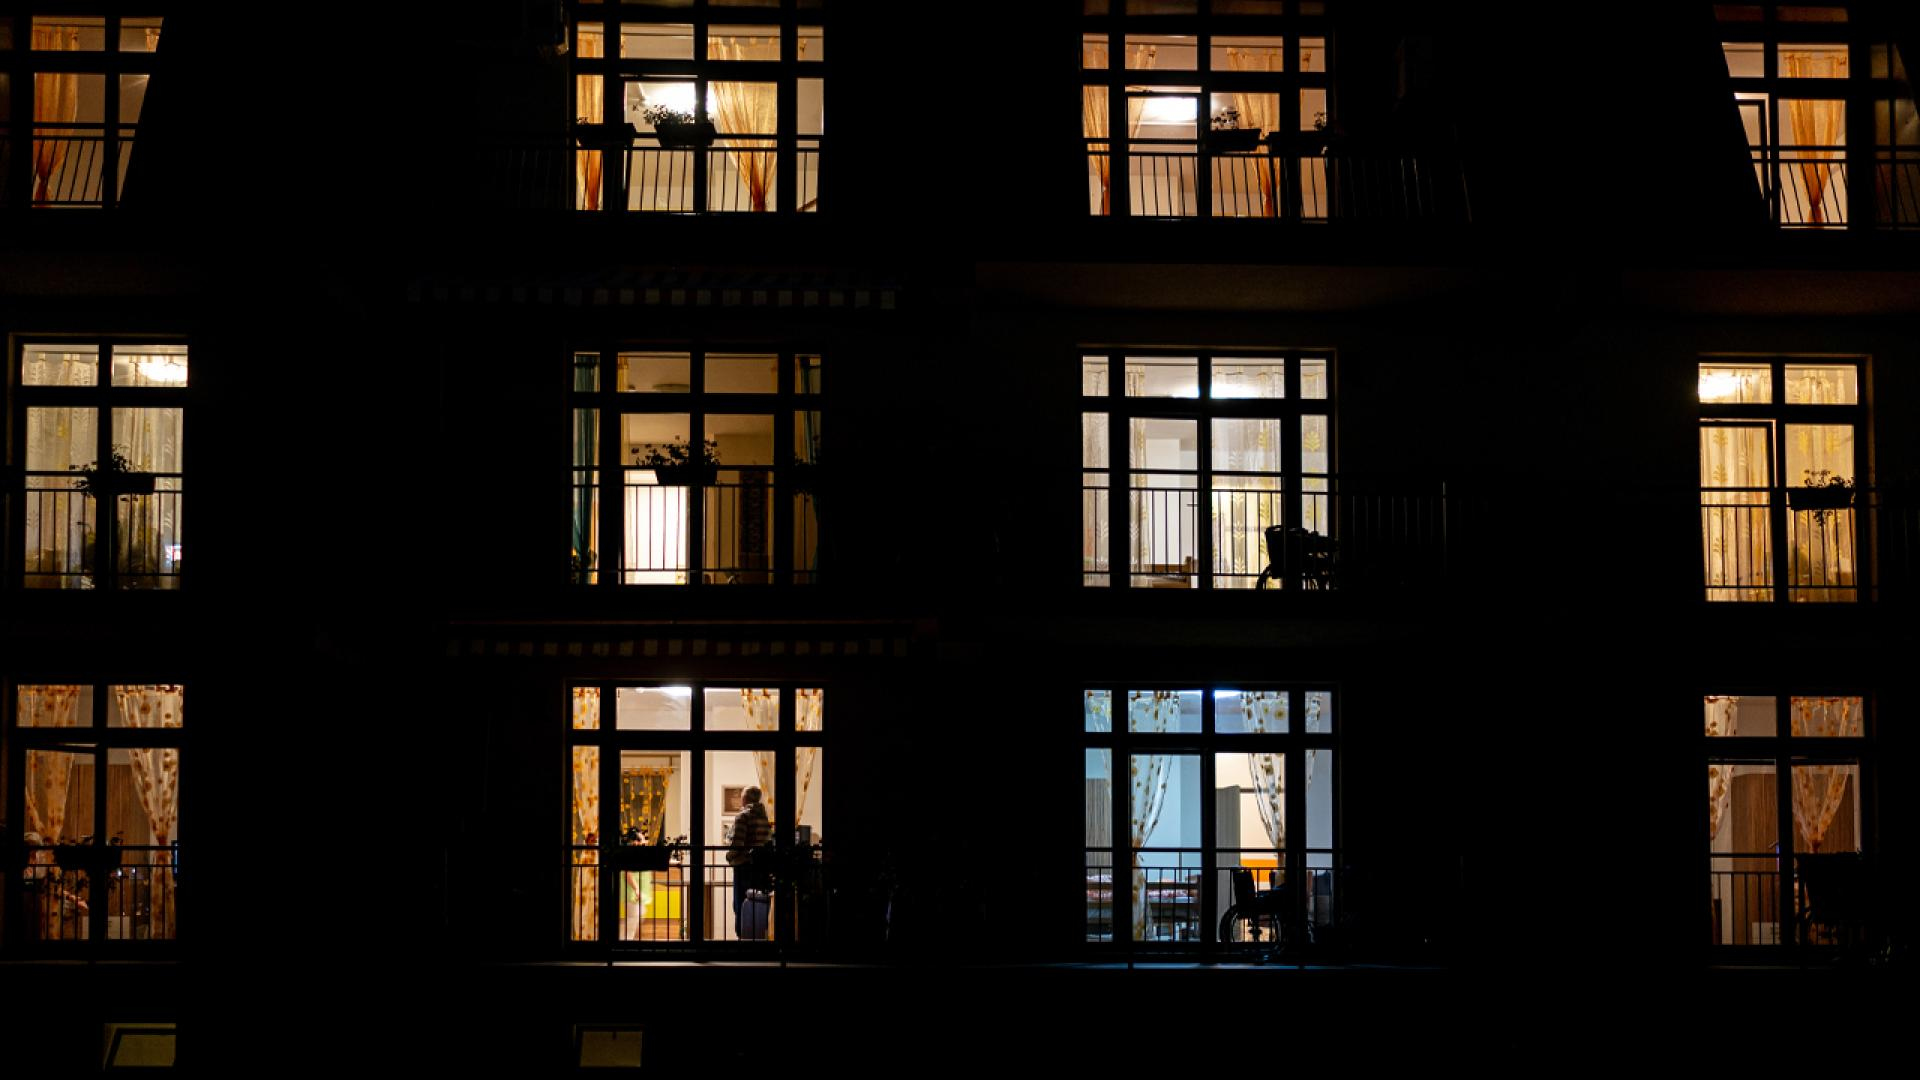 Illuminated windows of night house with people inside - stock photo